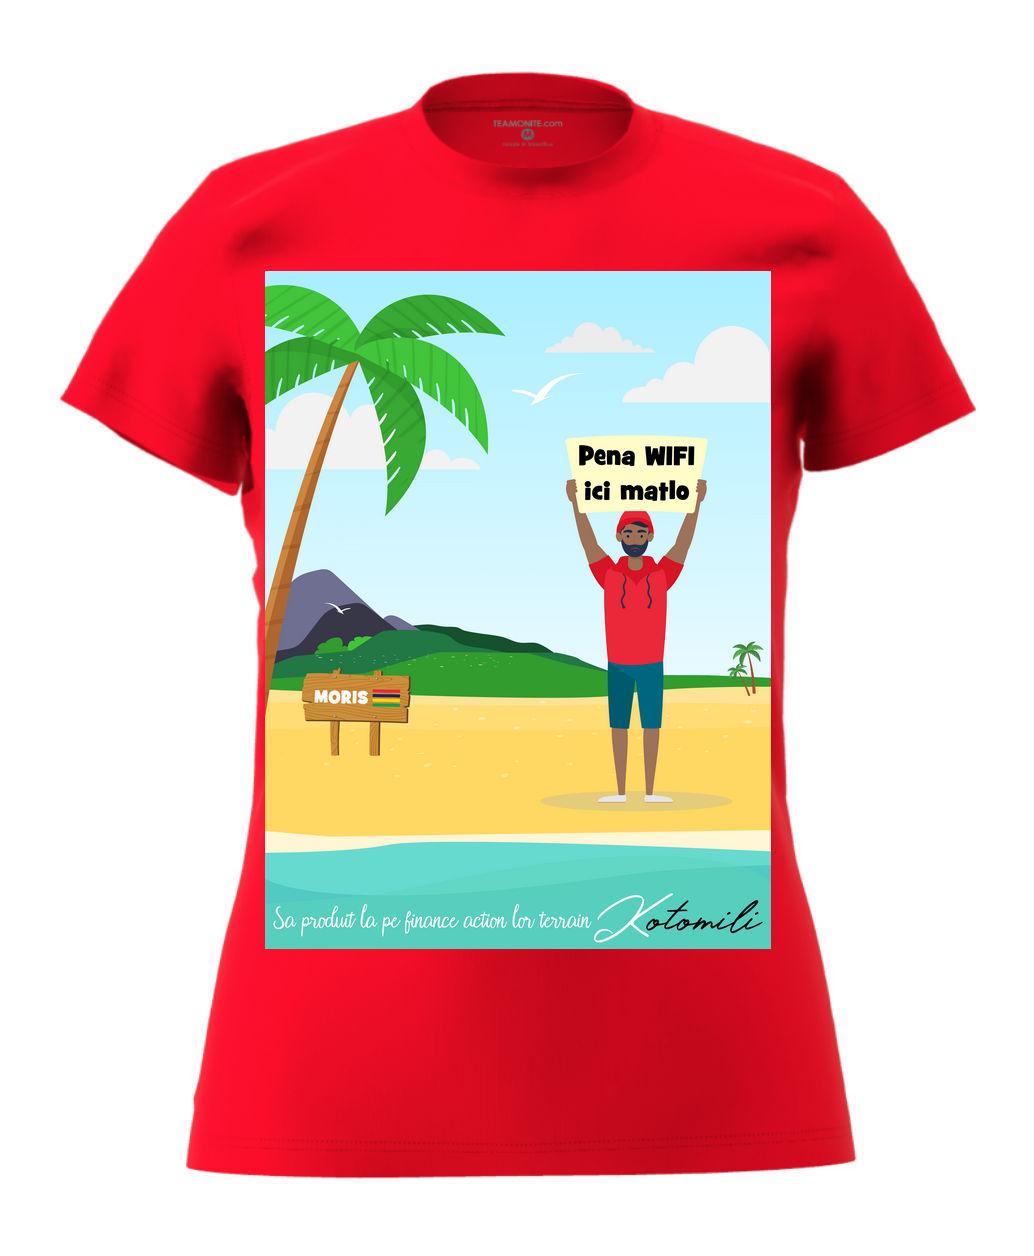 Pena WIFI ici Women's Modern Fit T-Shirt - Red